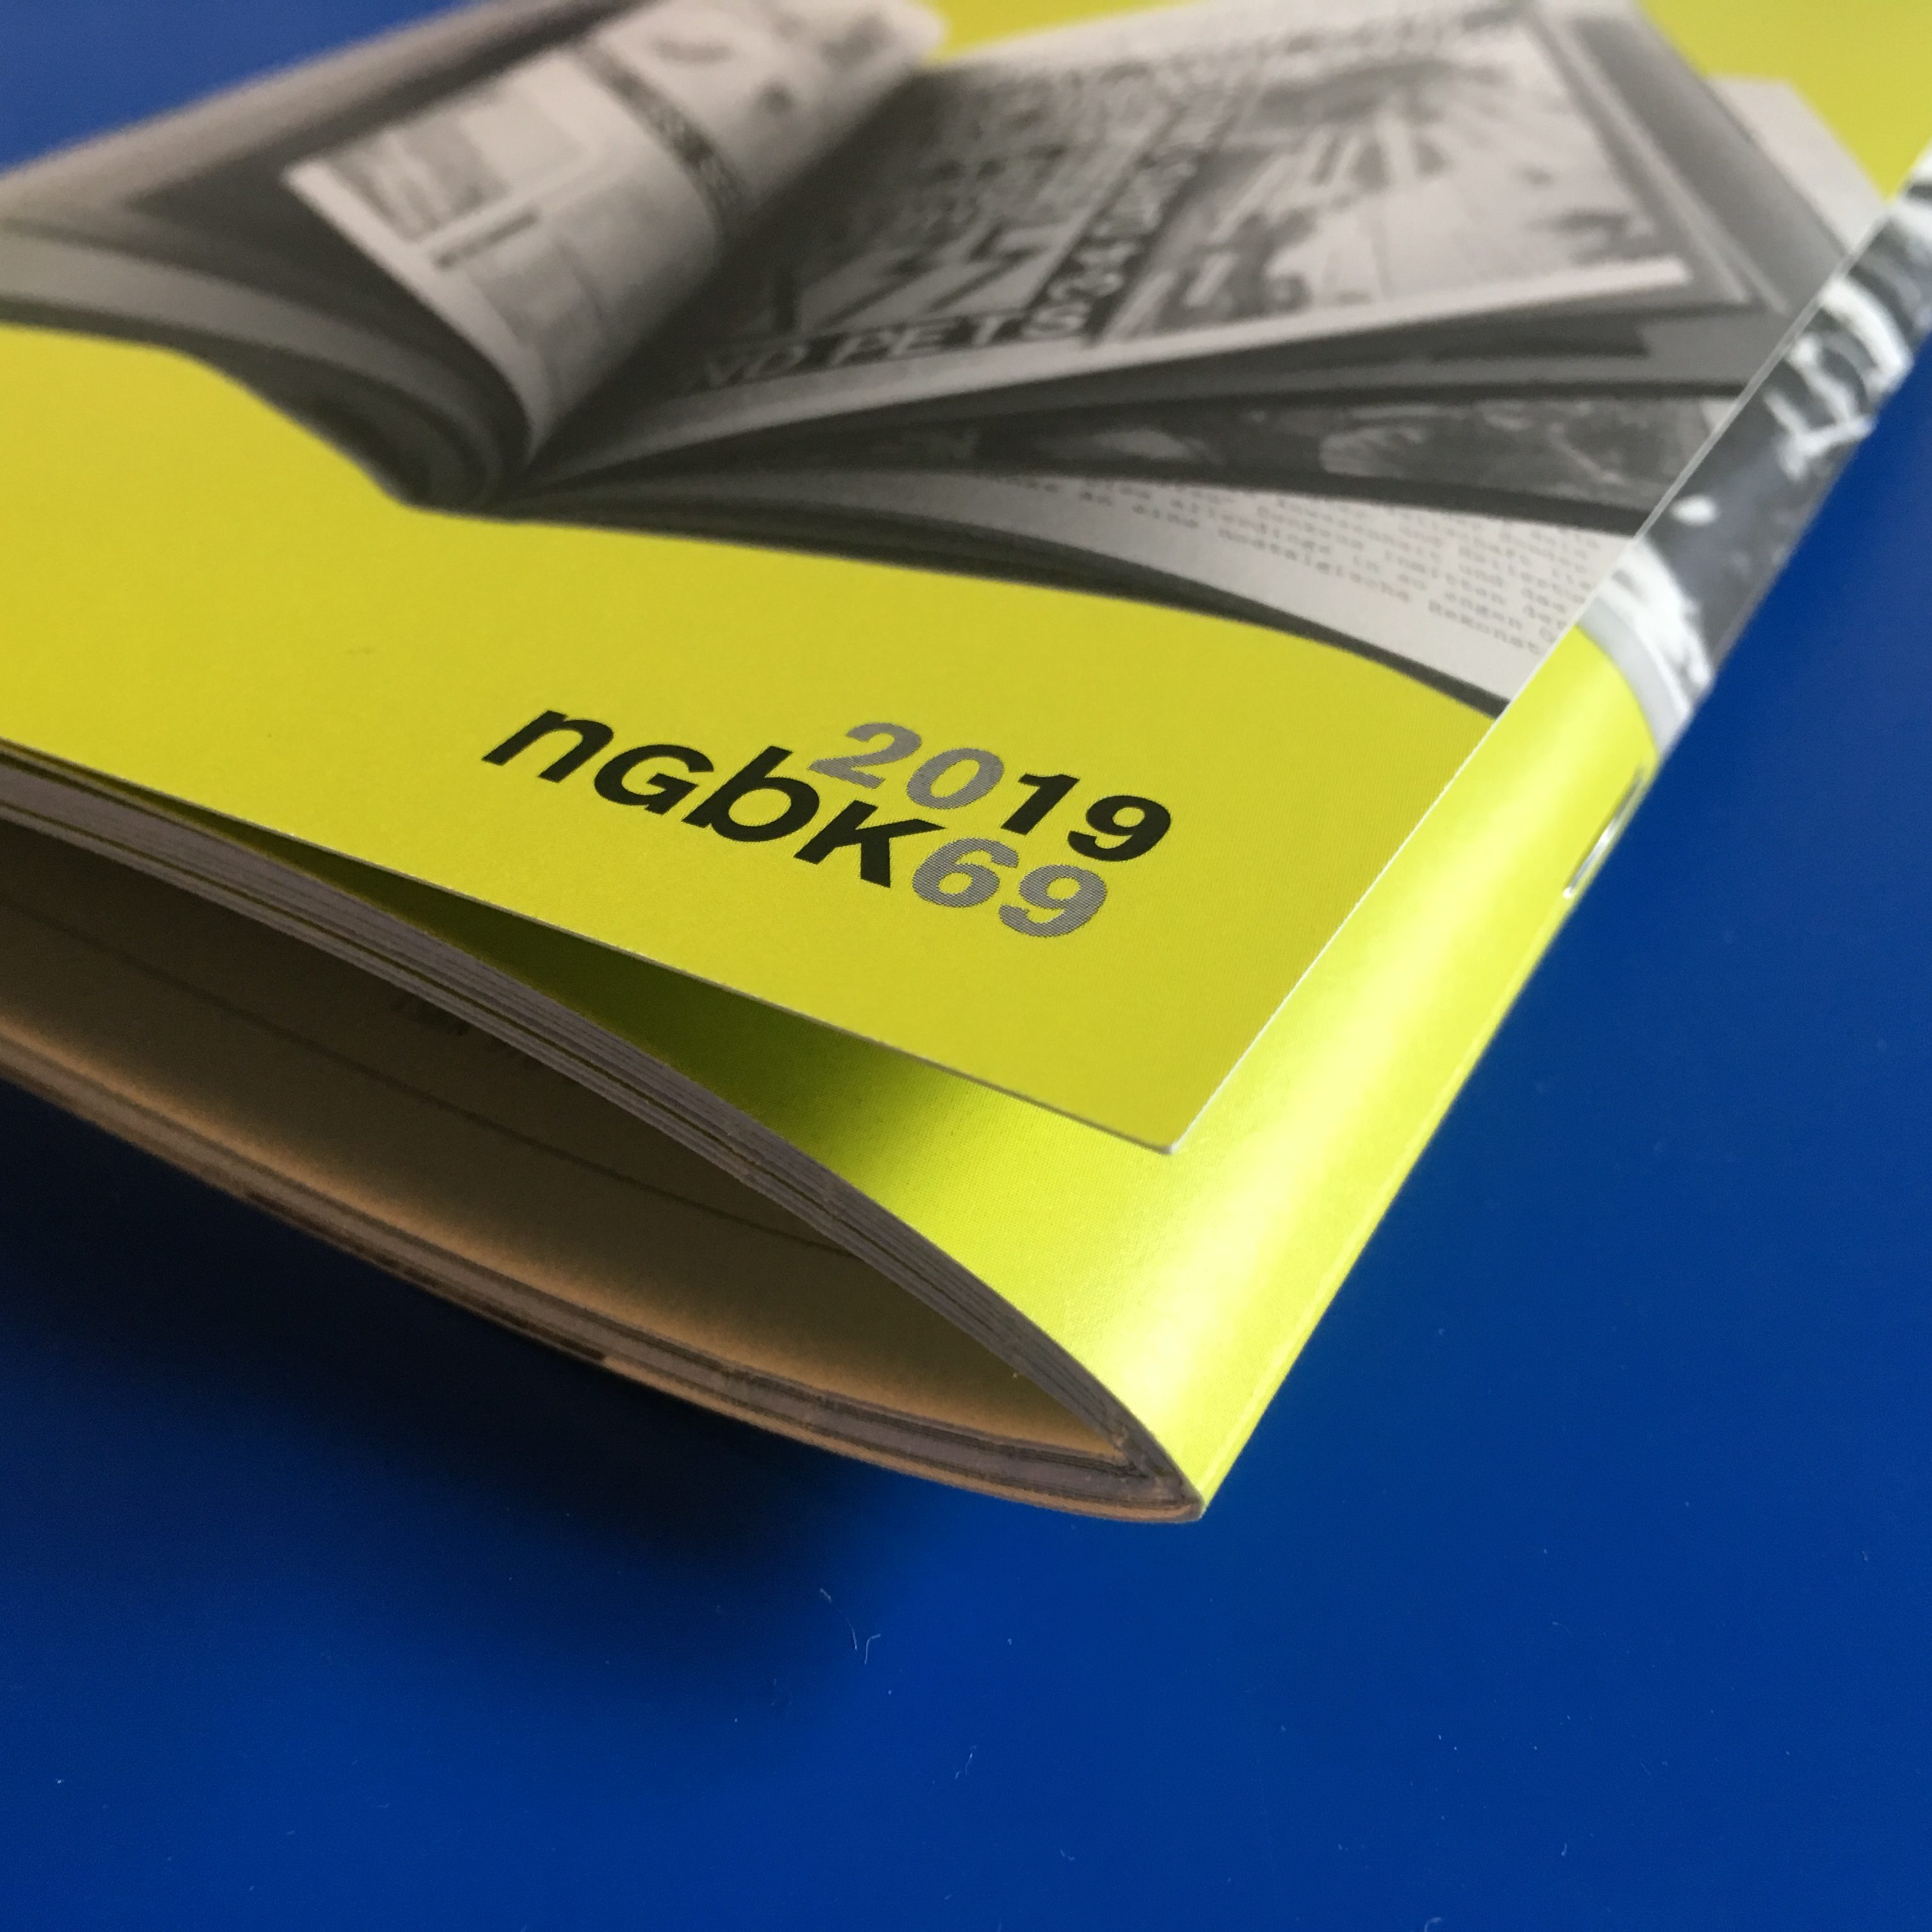 Cover-Verlagsverzeichnis-nGbK